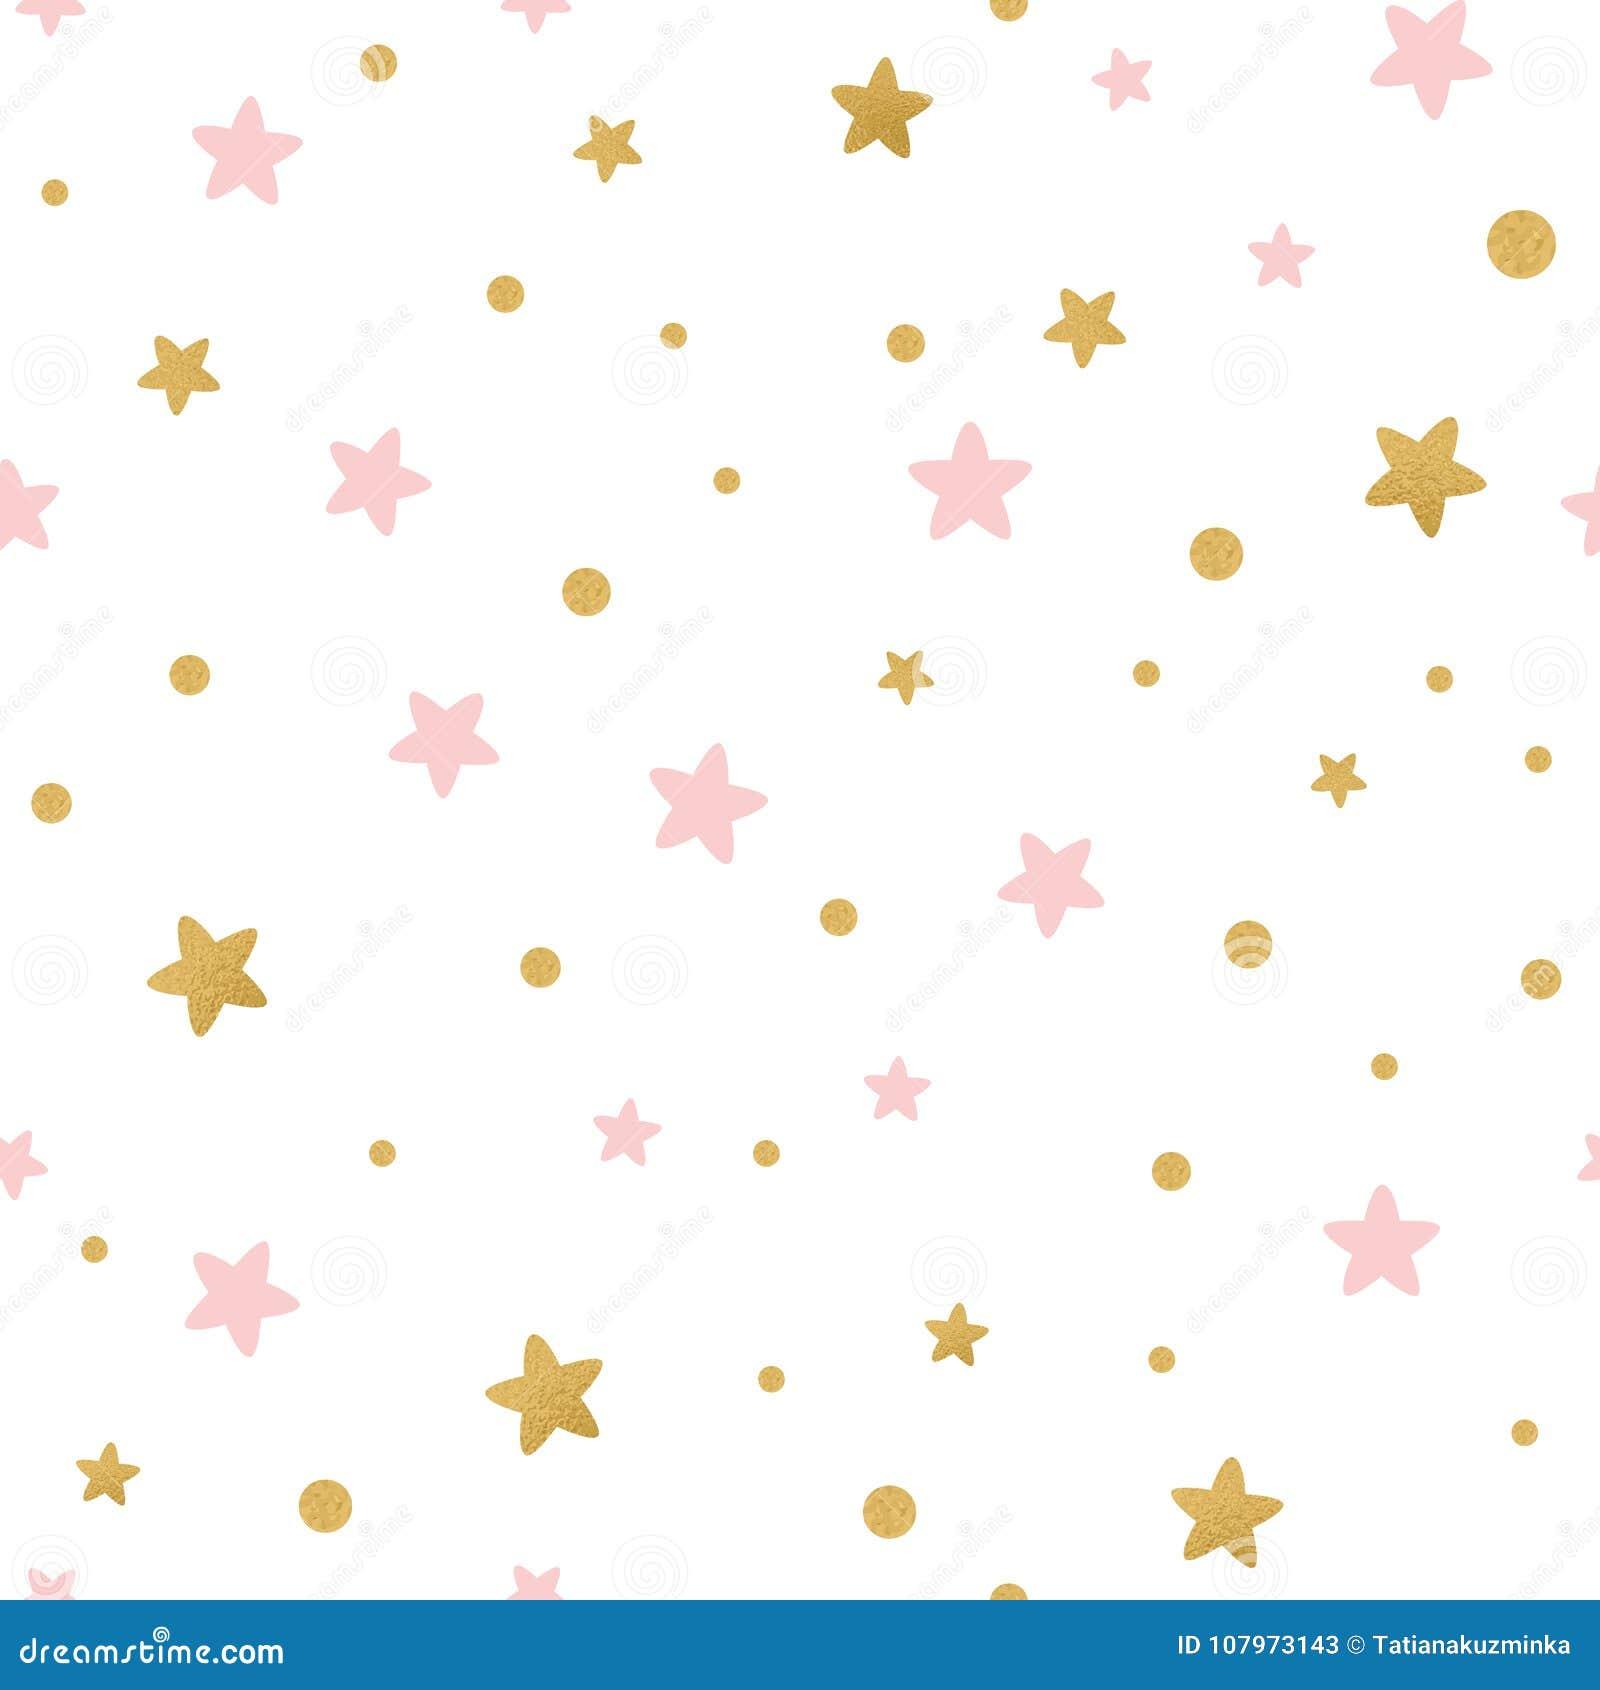 Vector las estrellas decoreted modelo inconsútil del rosa del oro para el backgound de la Navidad o la materia textil de la fiest